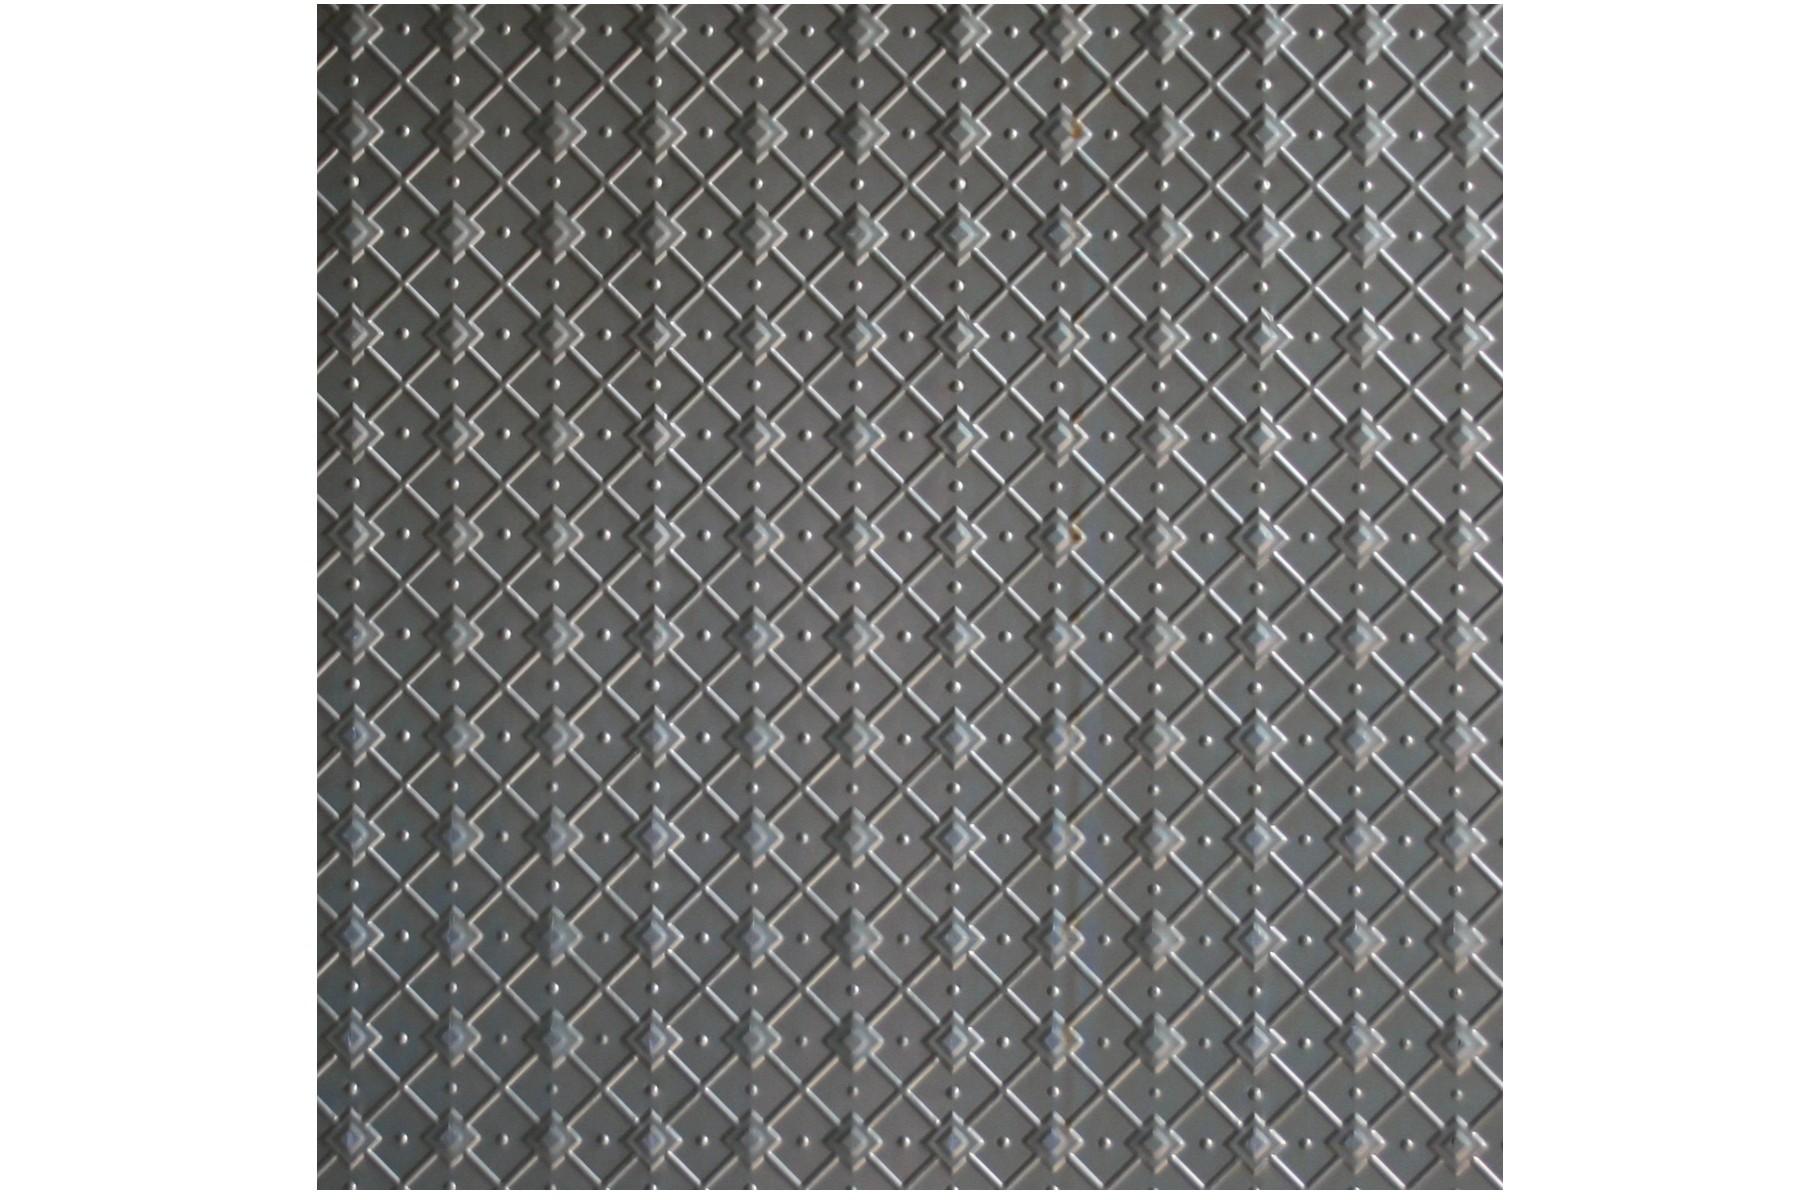 Wunderlich Pressed Metal Panels No 1389 Geometric